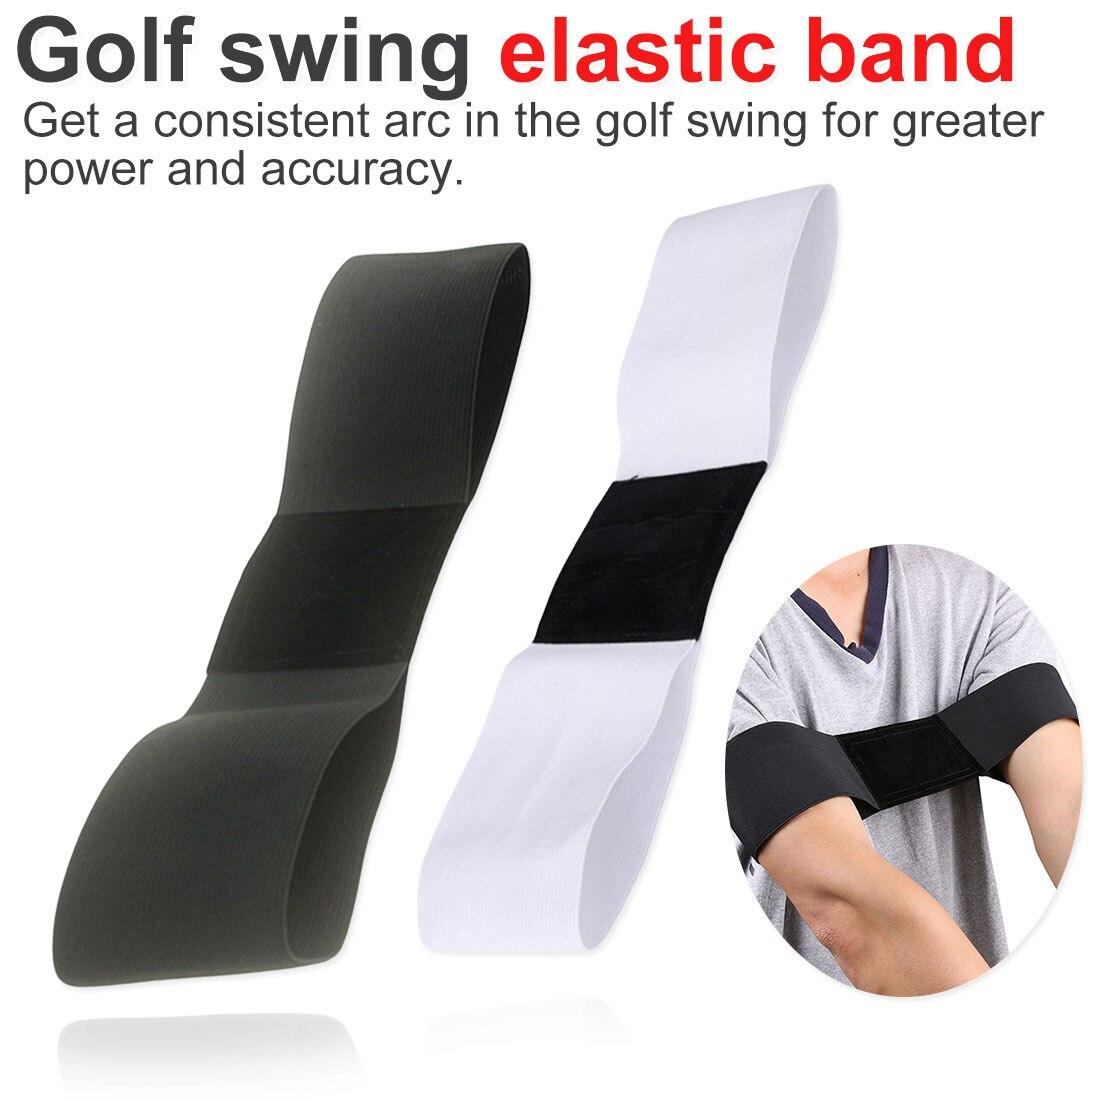 Outdoor Sports Protective Gear Golf Swing Elastic Band Elastic Nylon Golf Arm Posture Movement Correction Belt Golf Training